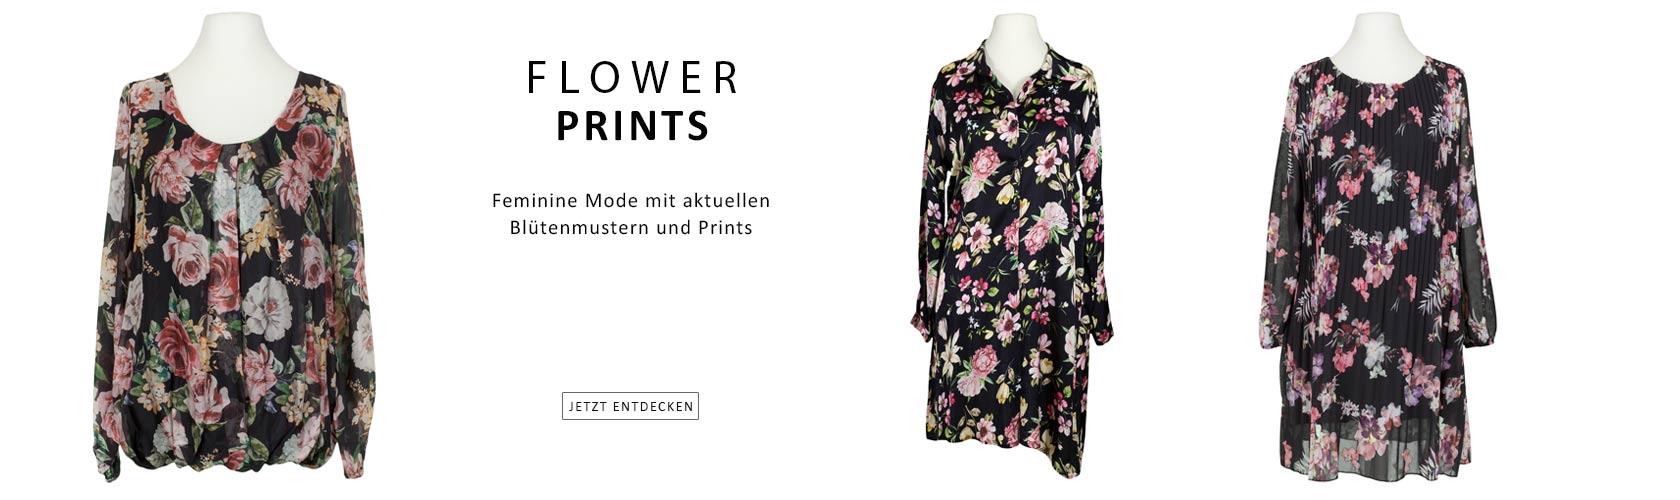 Flower Prints - Damenmode mit aktuellen Blumenprints entdecken